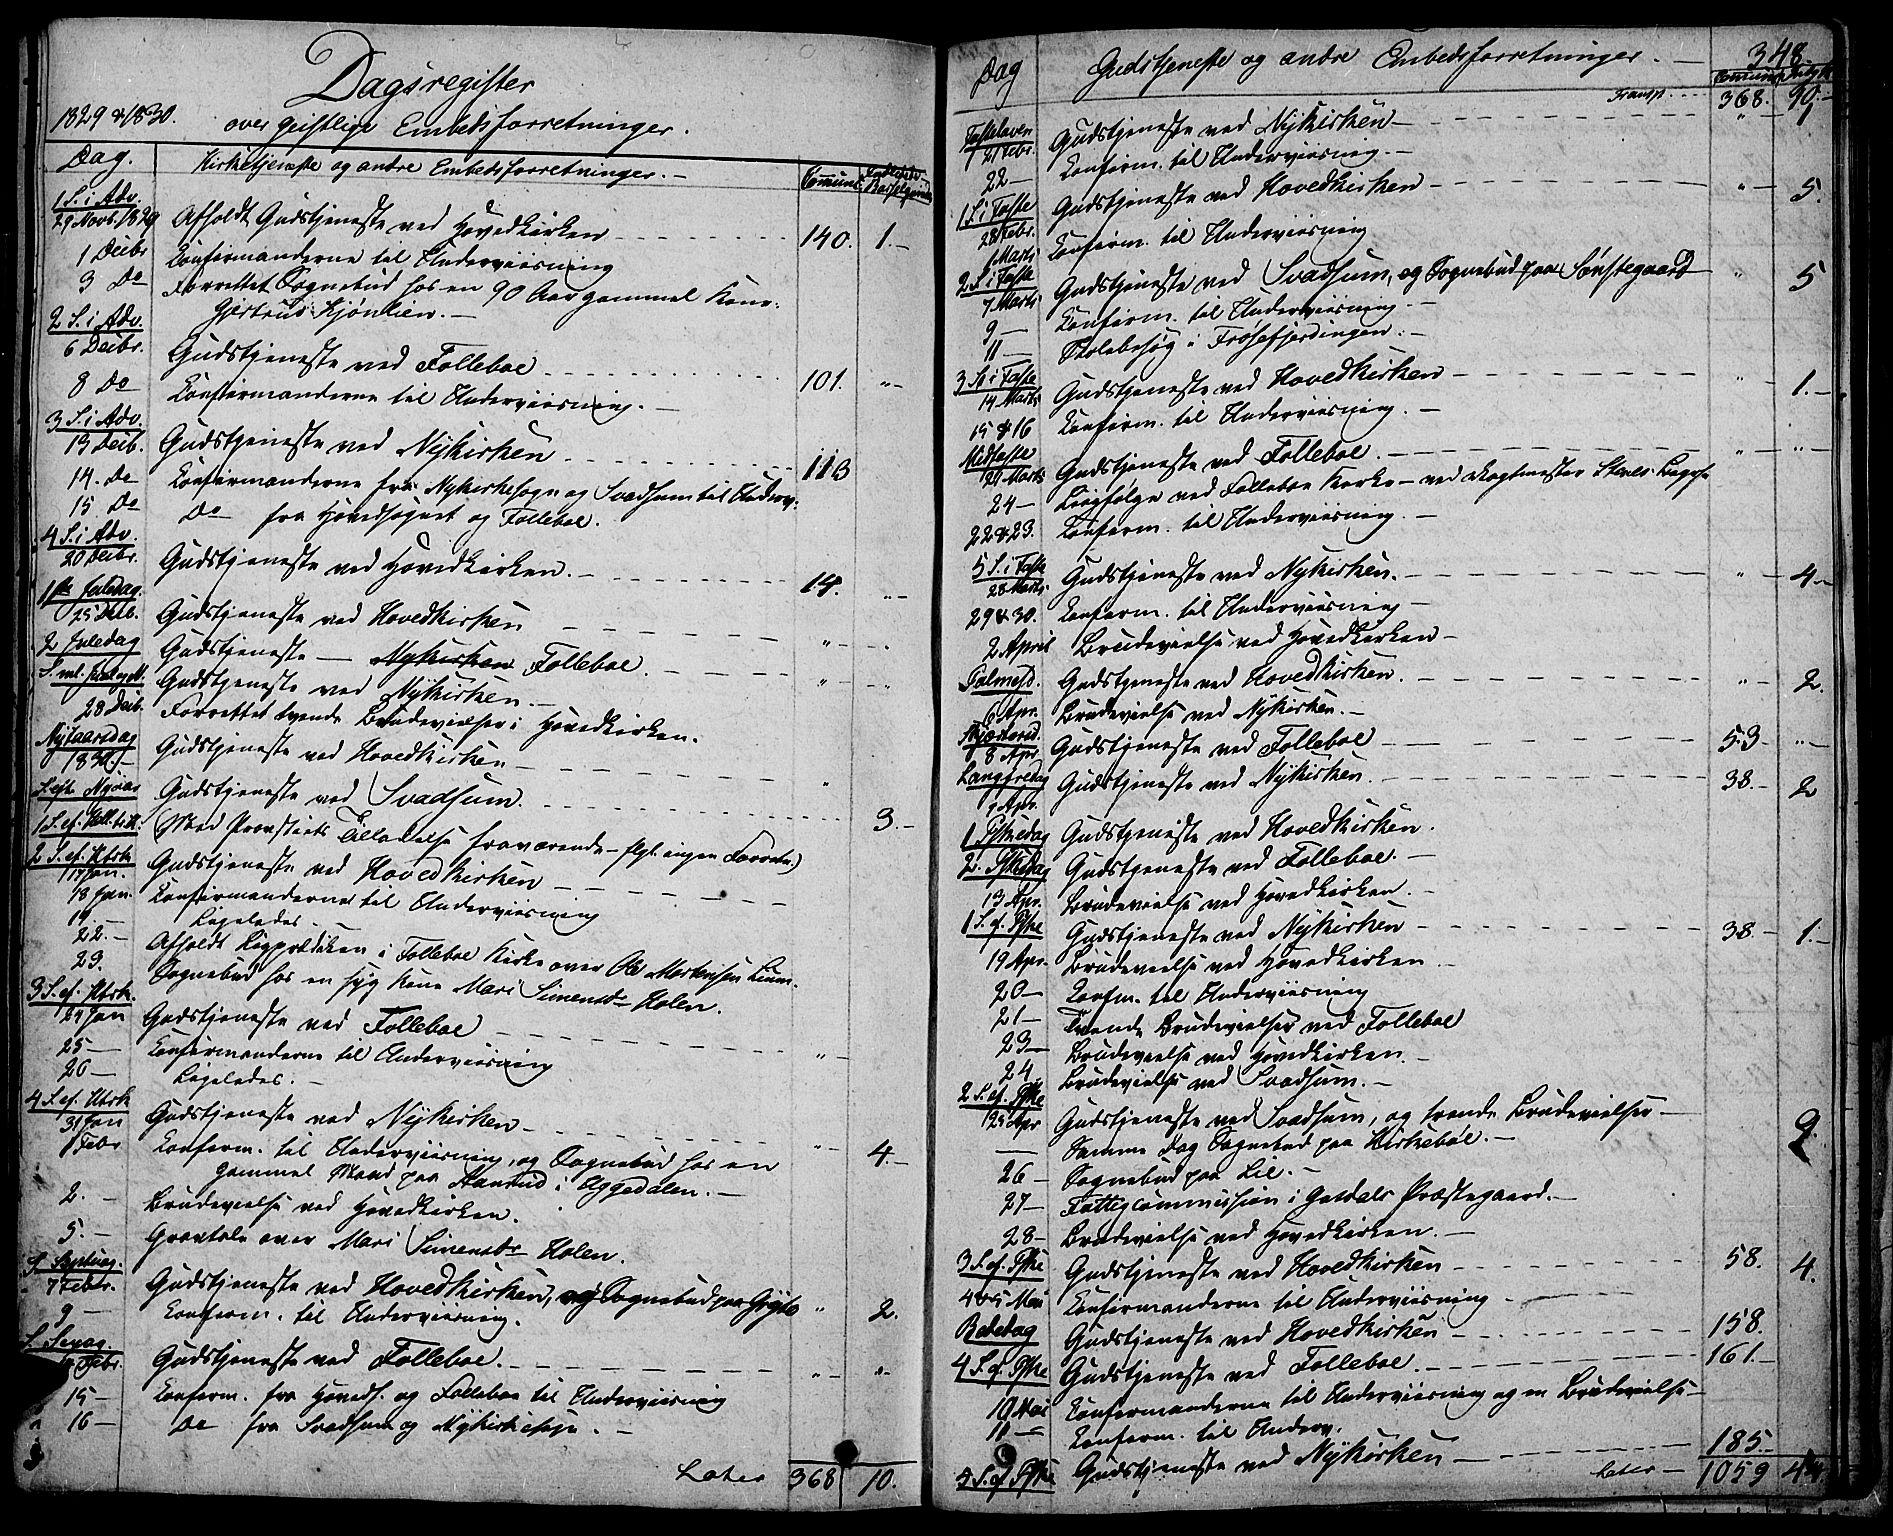 SAH, Gausdal prestekontor, Ministerialbok nr. 6, 1830-1839, s. 348